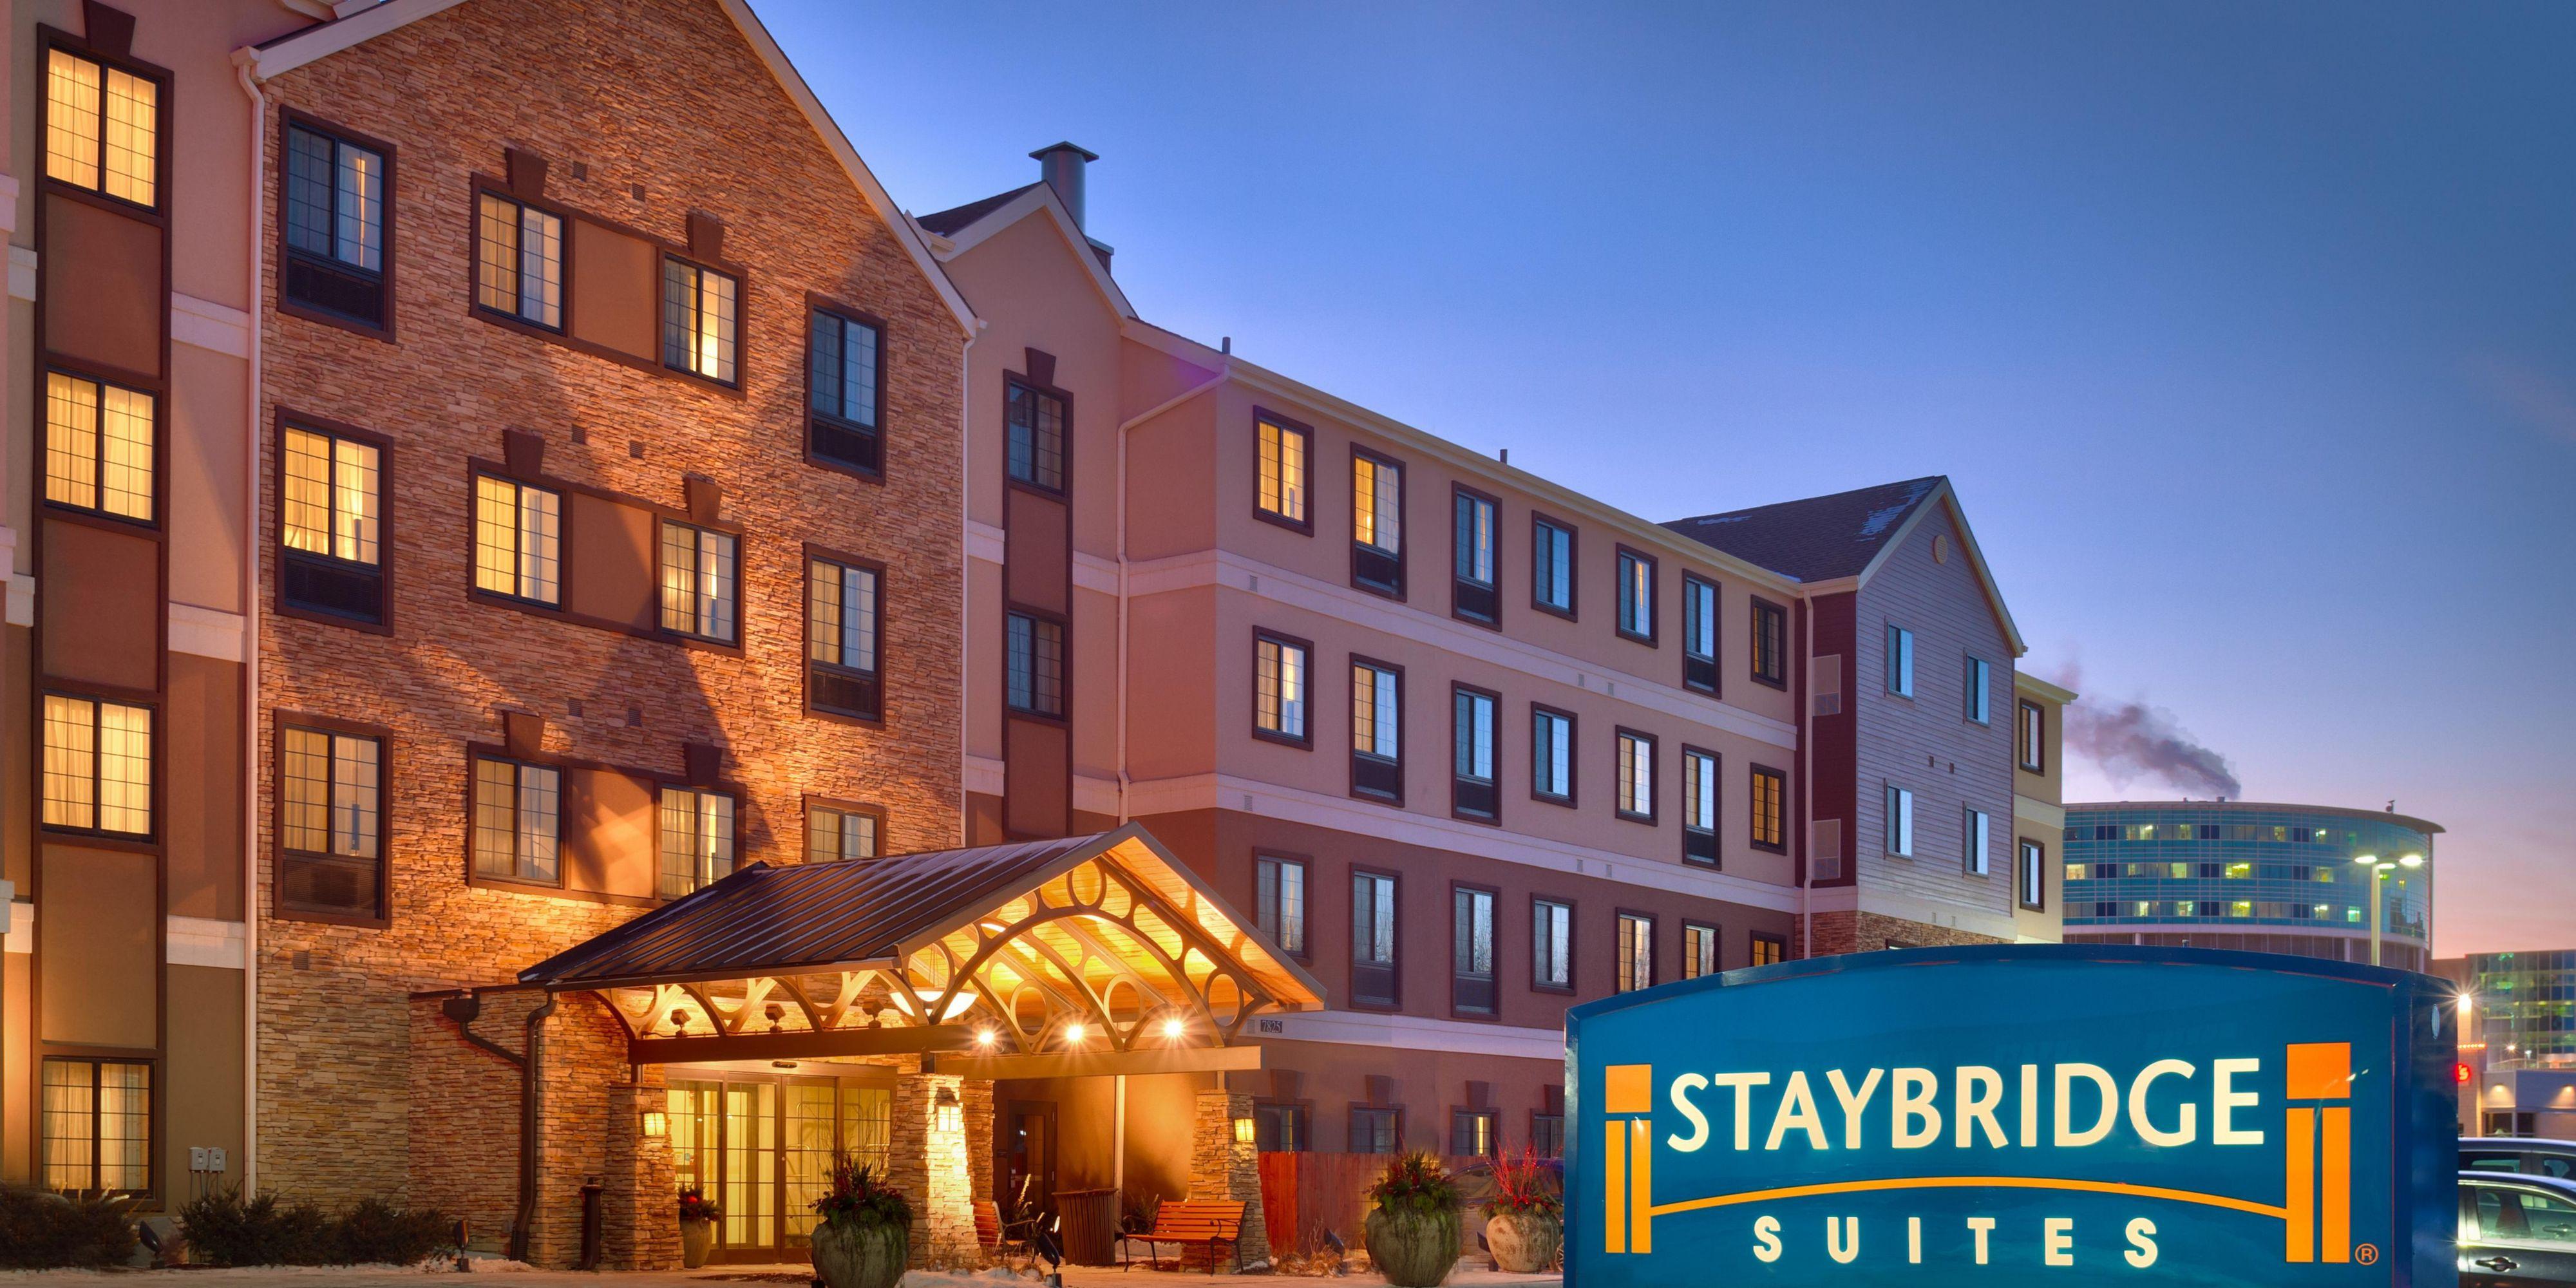 Staybridge Suites Omaha 80th And Dodge